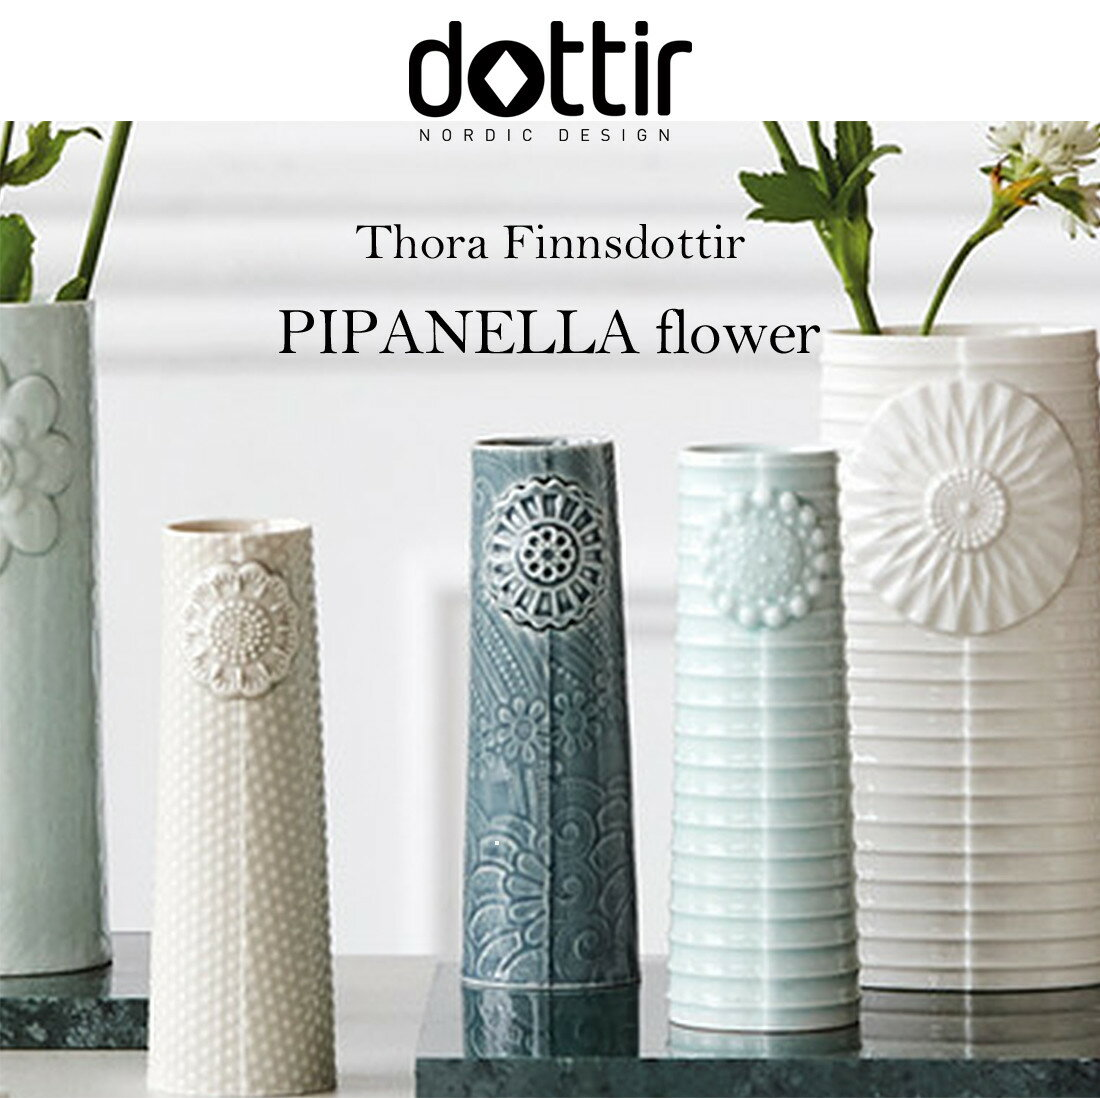 dottir(ドティエ)Pipanella『FLOWERBIG』